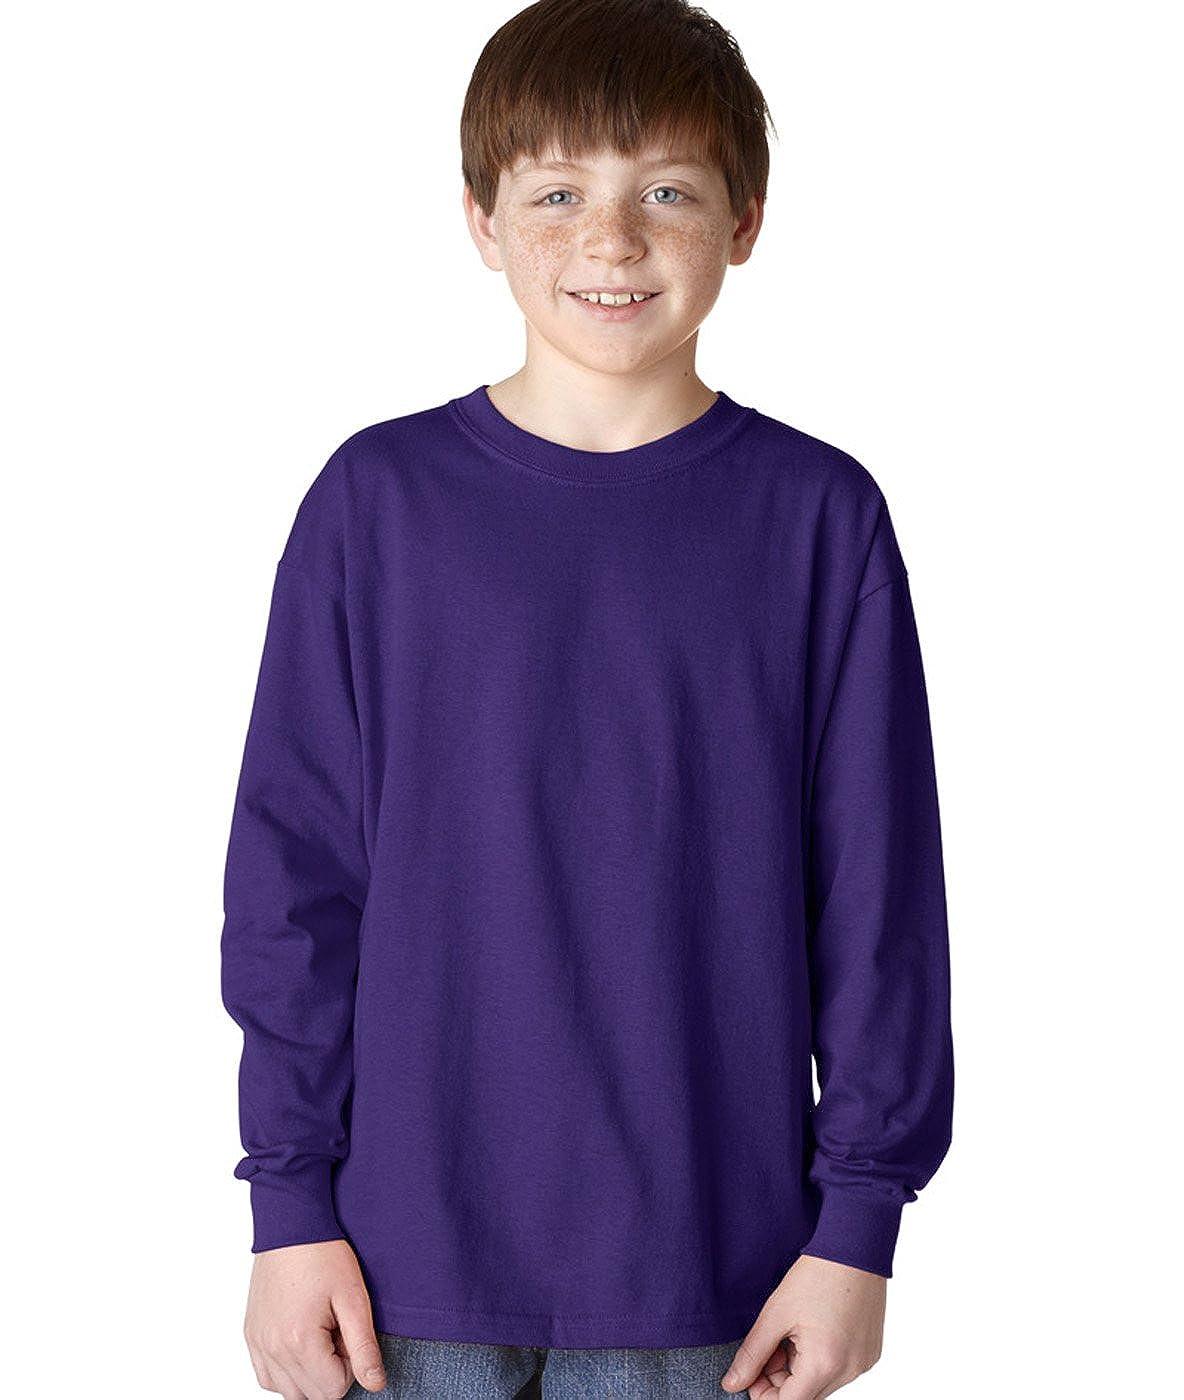 Heavy Cotton Long-Sleeve T-Shirt -PURPLE -M-12PK G540B Gildan Boys 5.3 oz